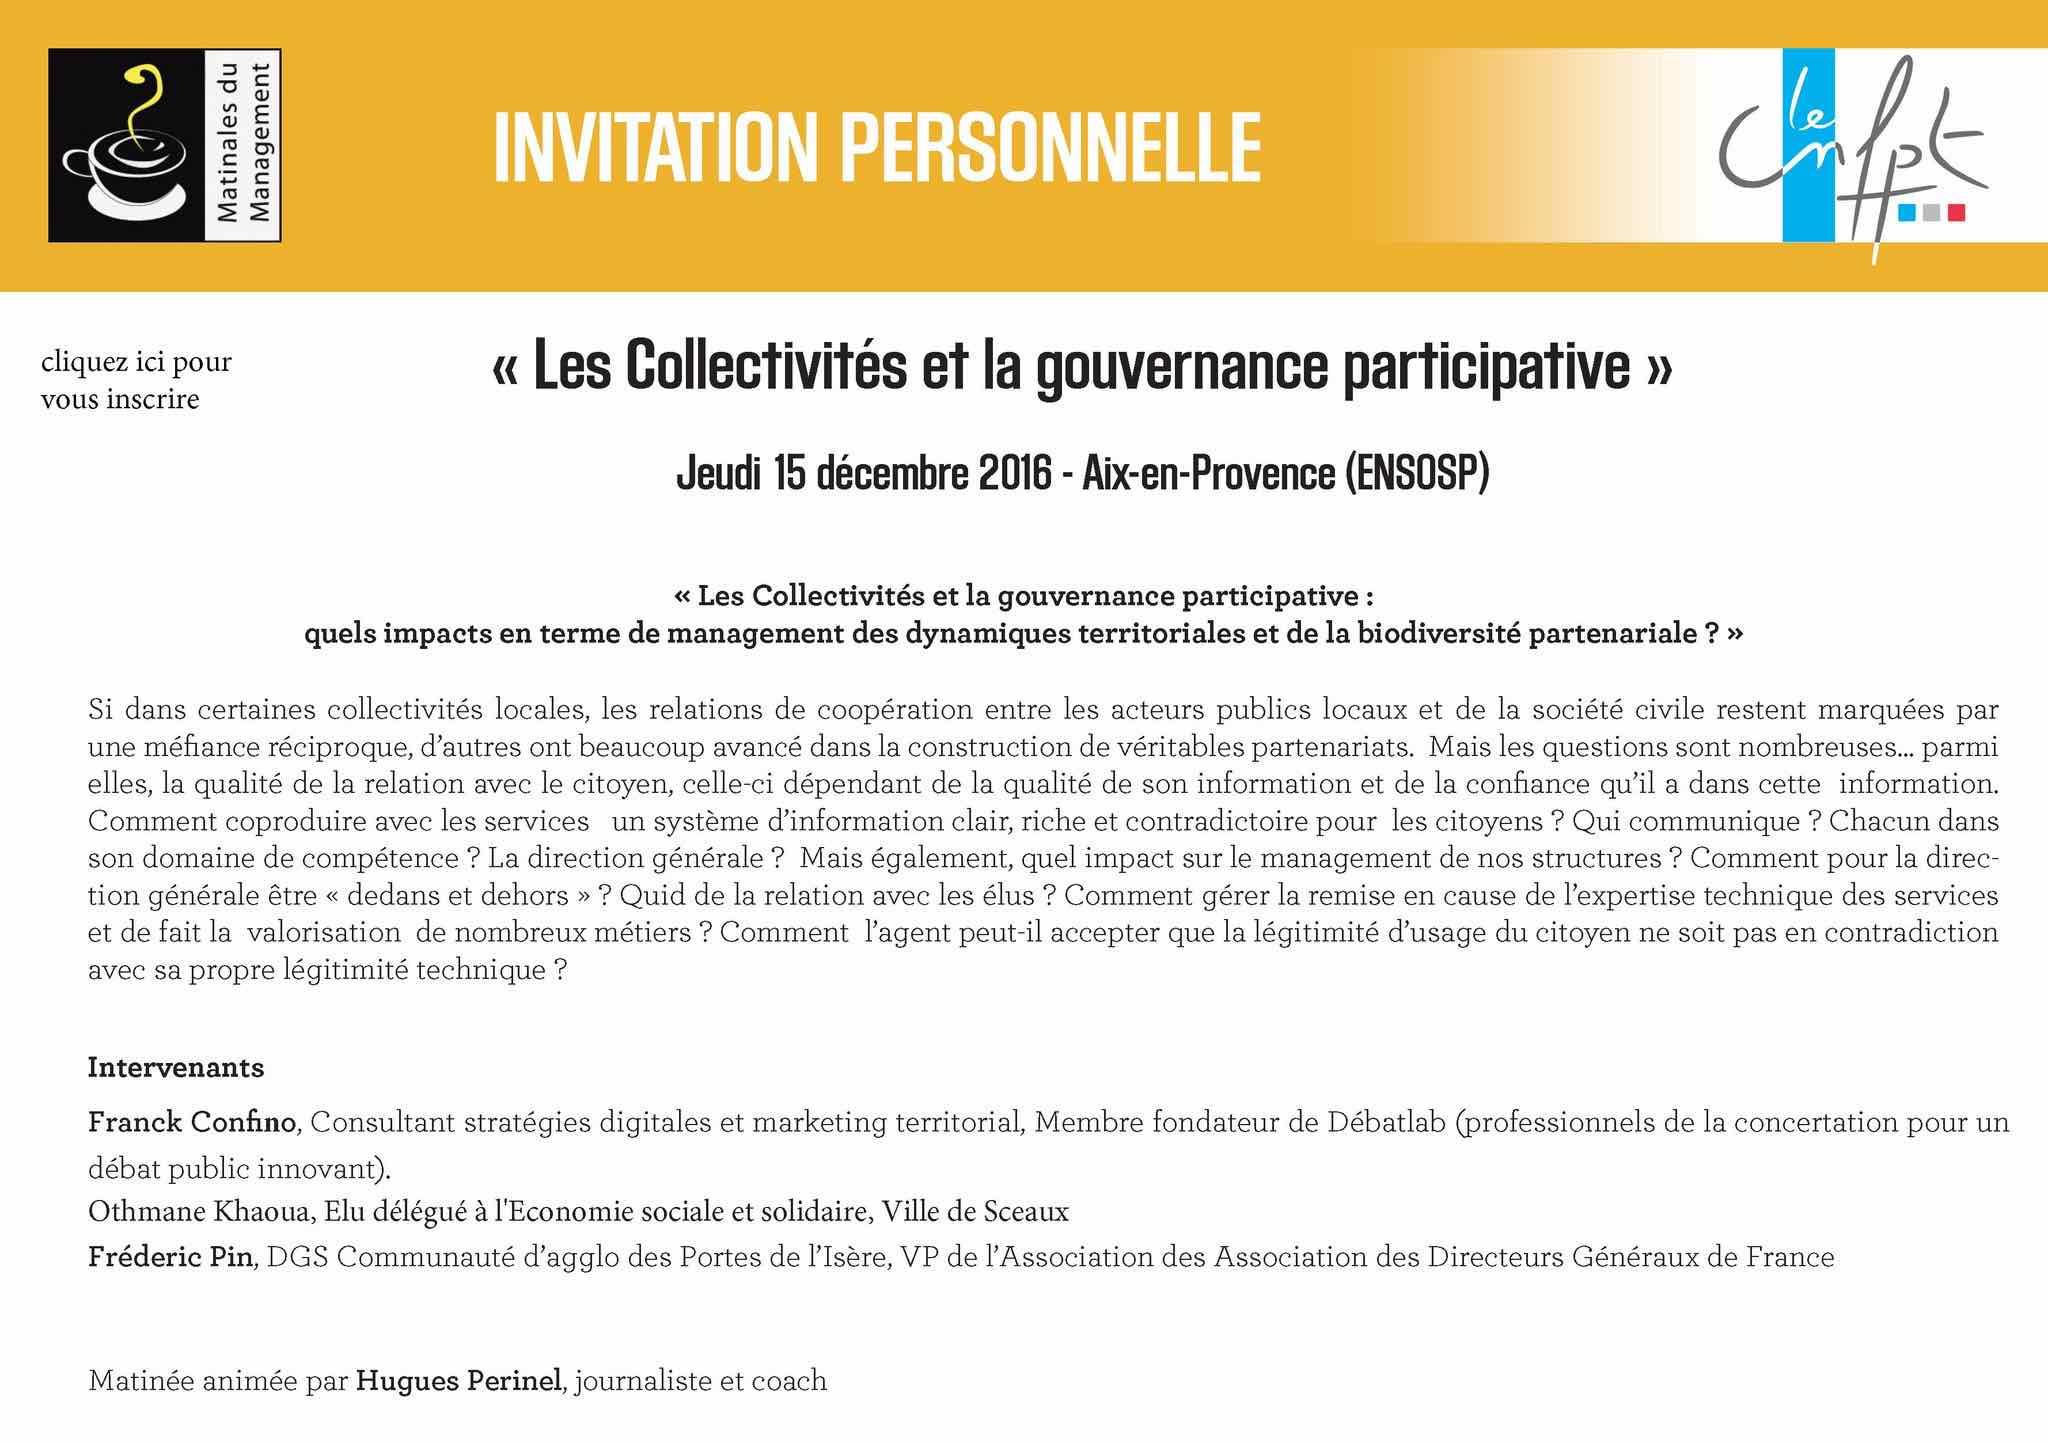 CNFPT_collectivites_gouvernance_participative_franck_confino